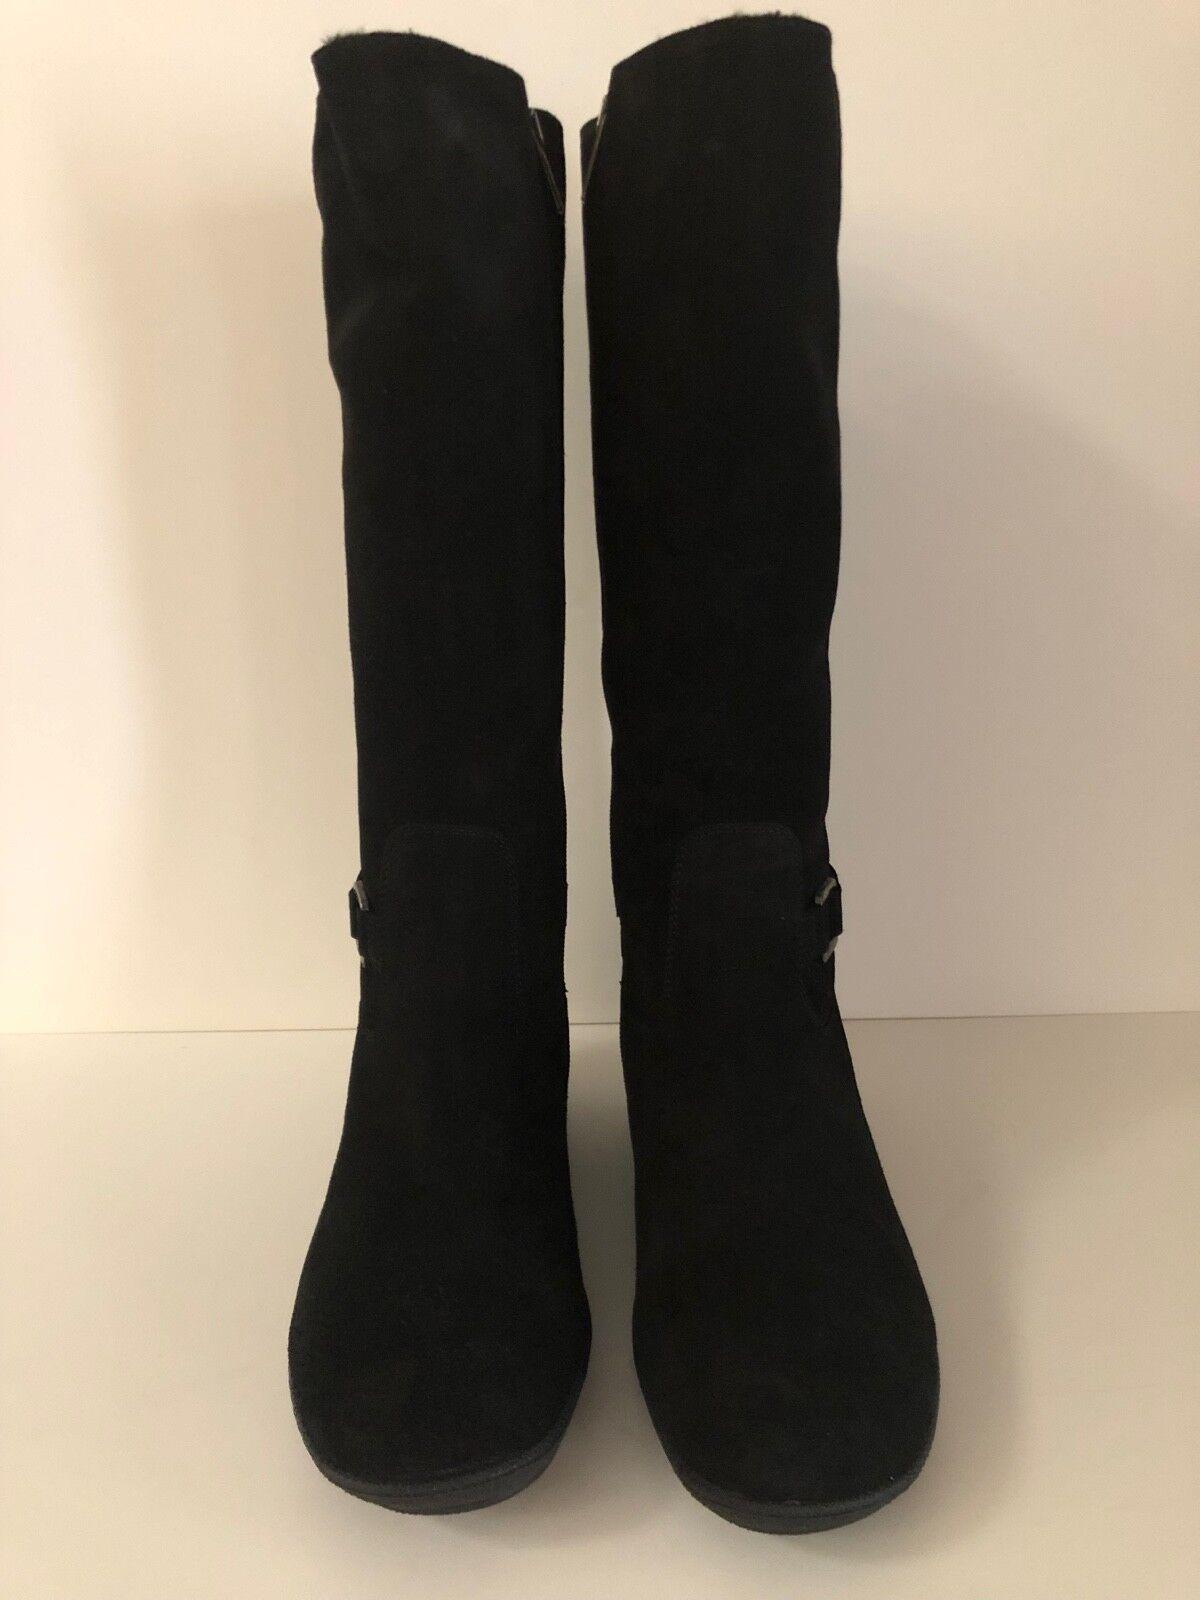 Aquatalia Womens Tall Suede Black Boots weatherproof 11 11 11 US  43 EUR New in Box a9fbc2